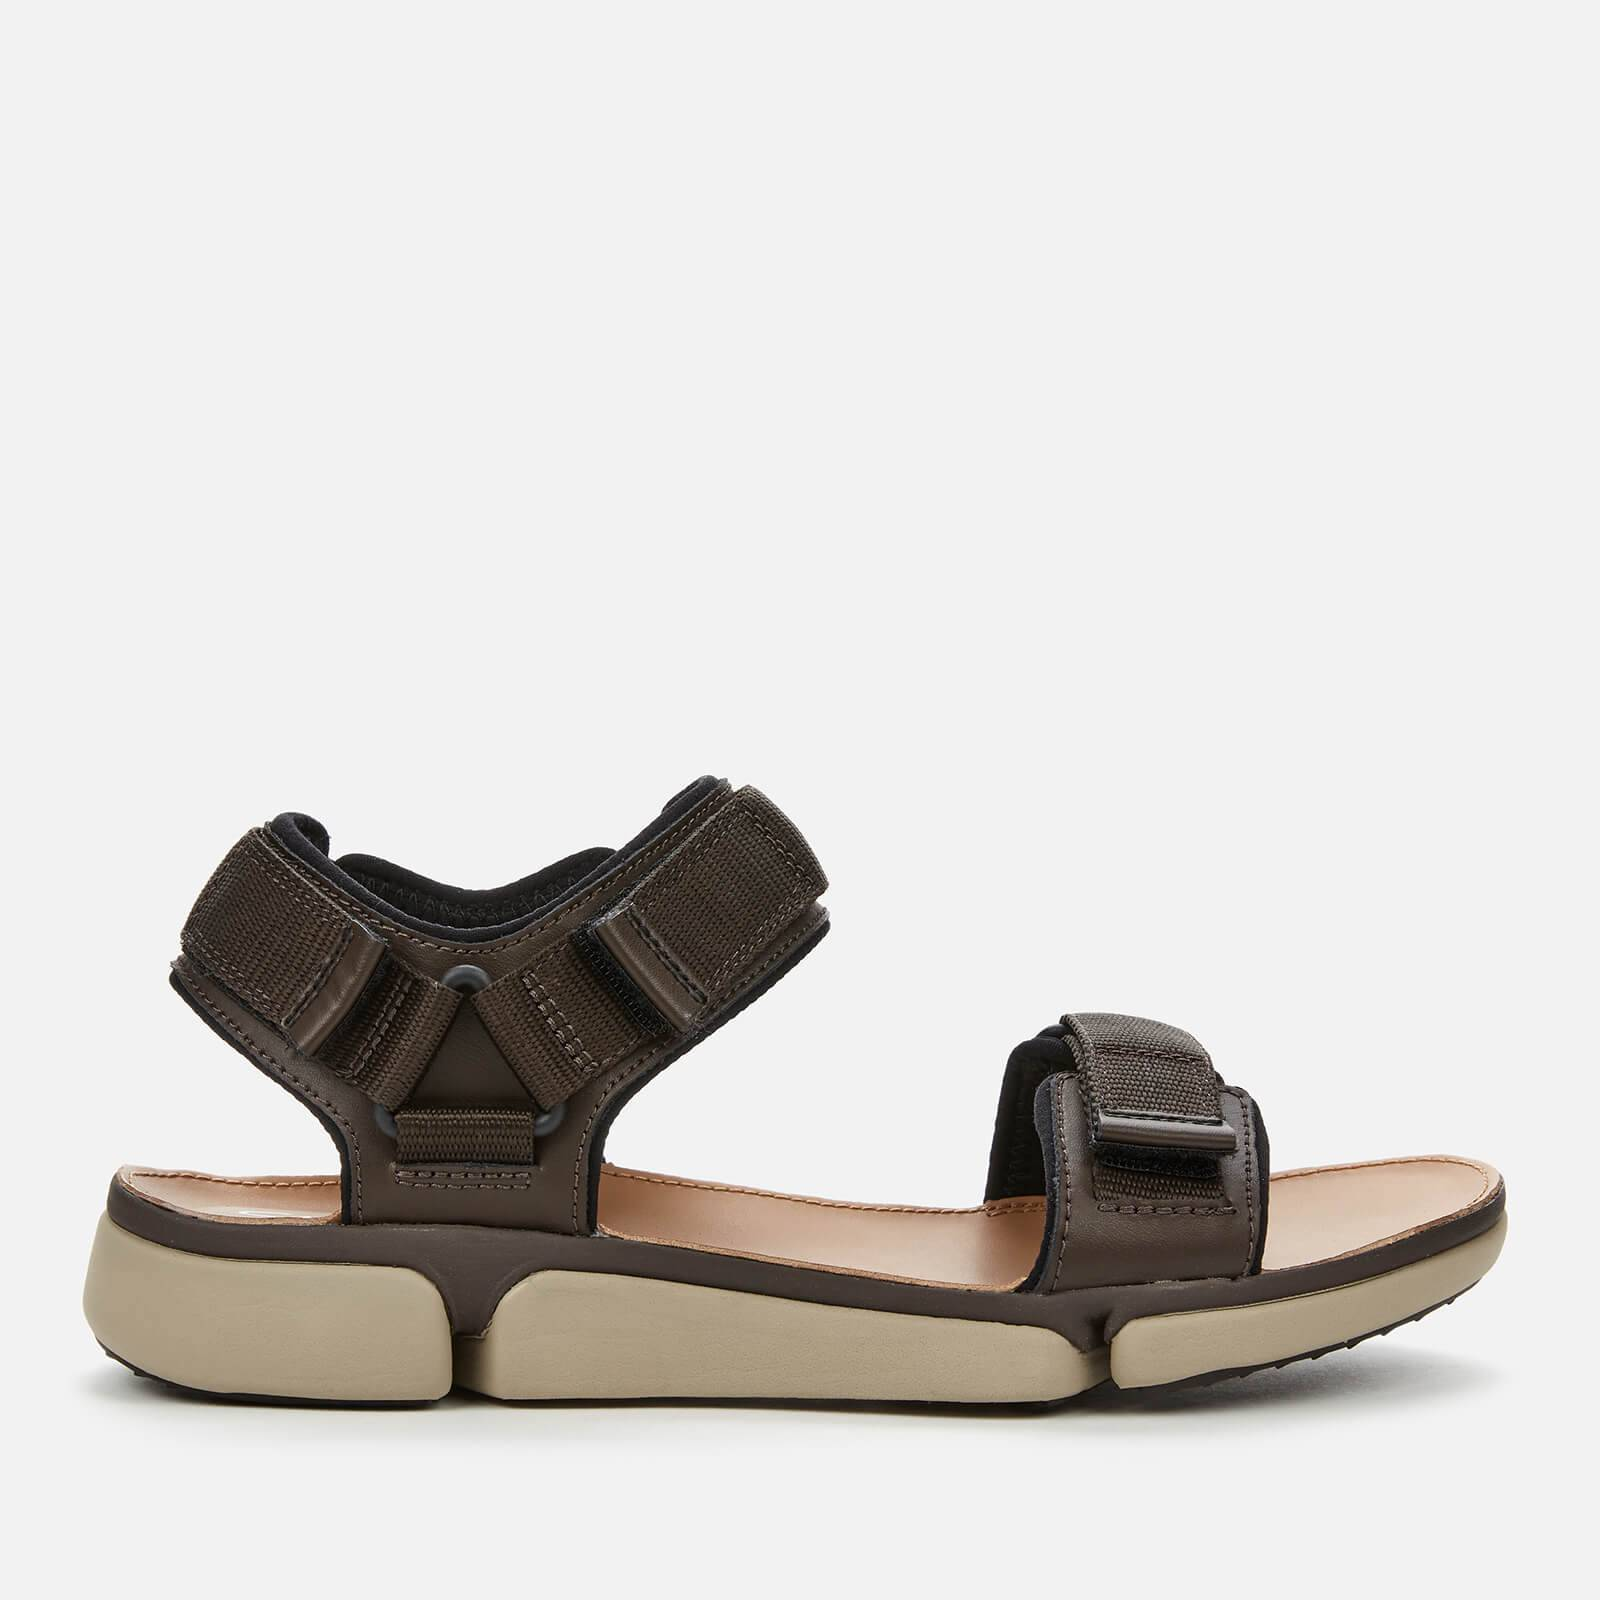 Clarks Men's Tri Cove Trail Outdoor Sandals - Dark Brown Combi - UK 11